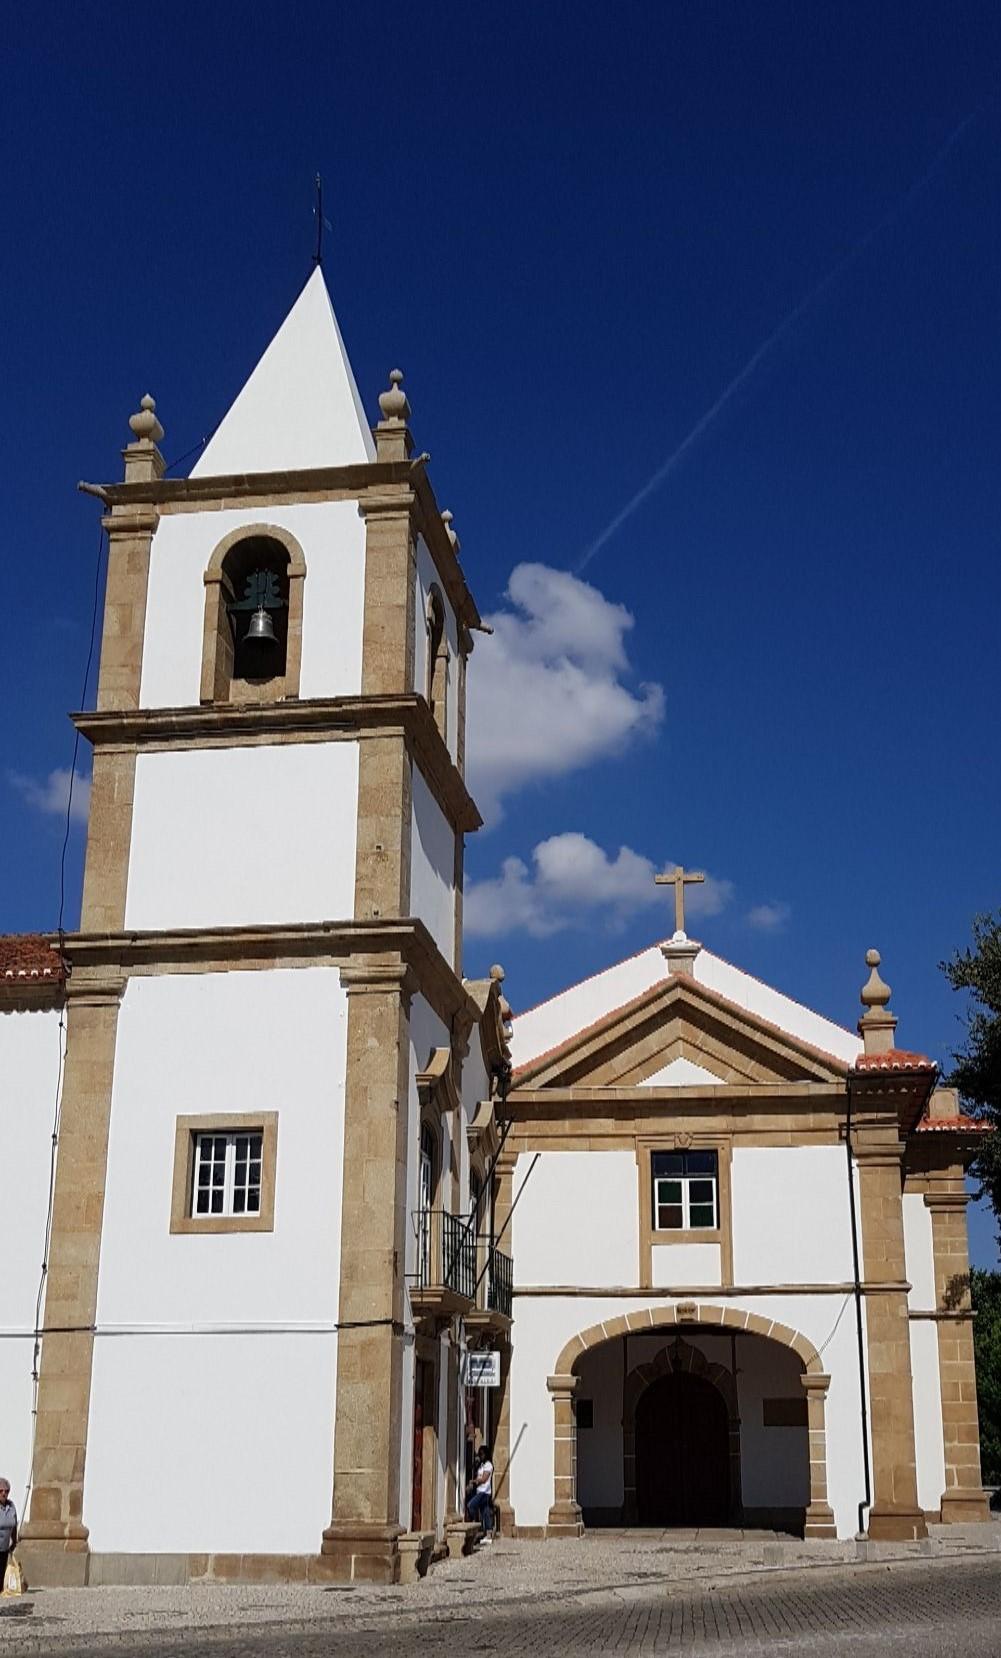 castelo branco gastronomie portugal